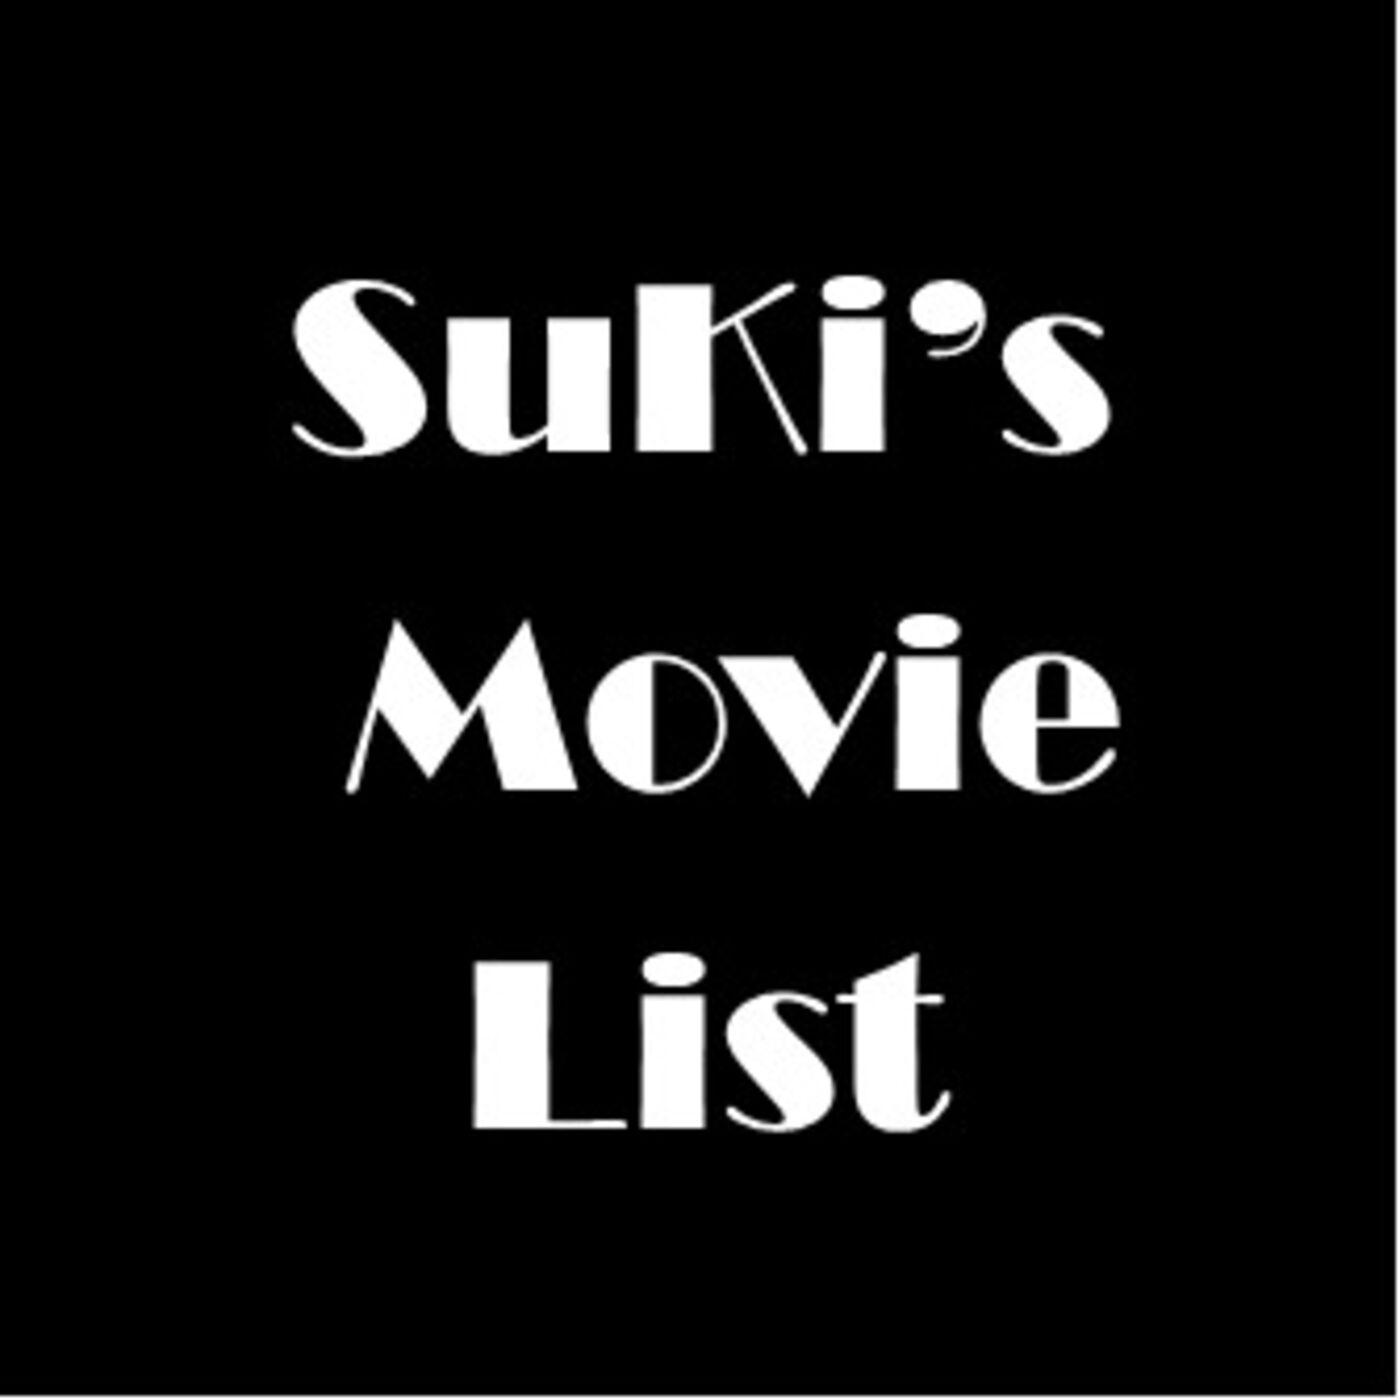 SuKi's Movie List